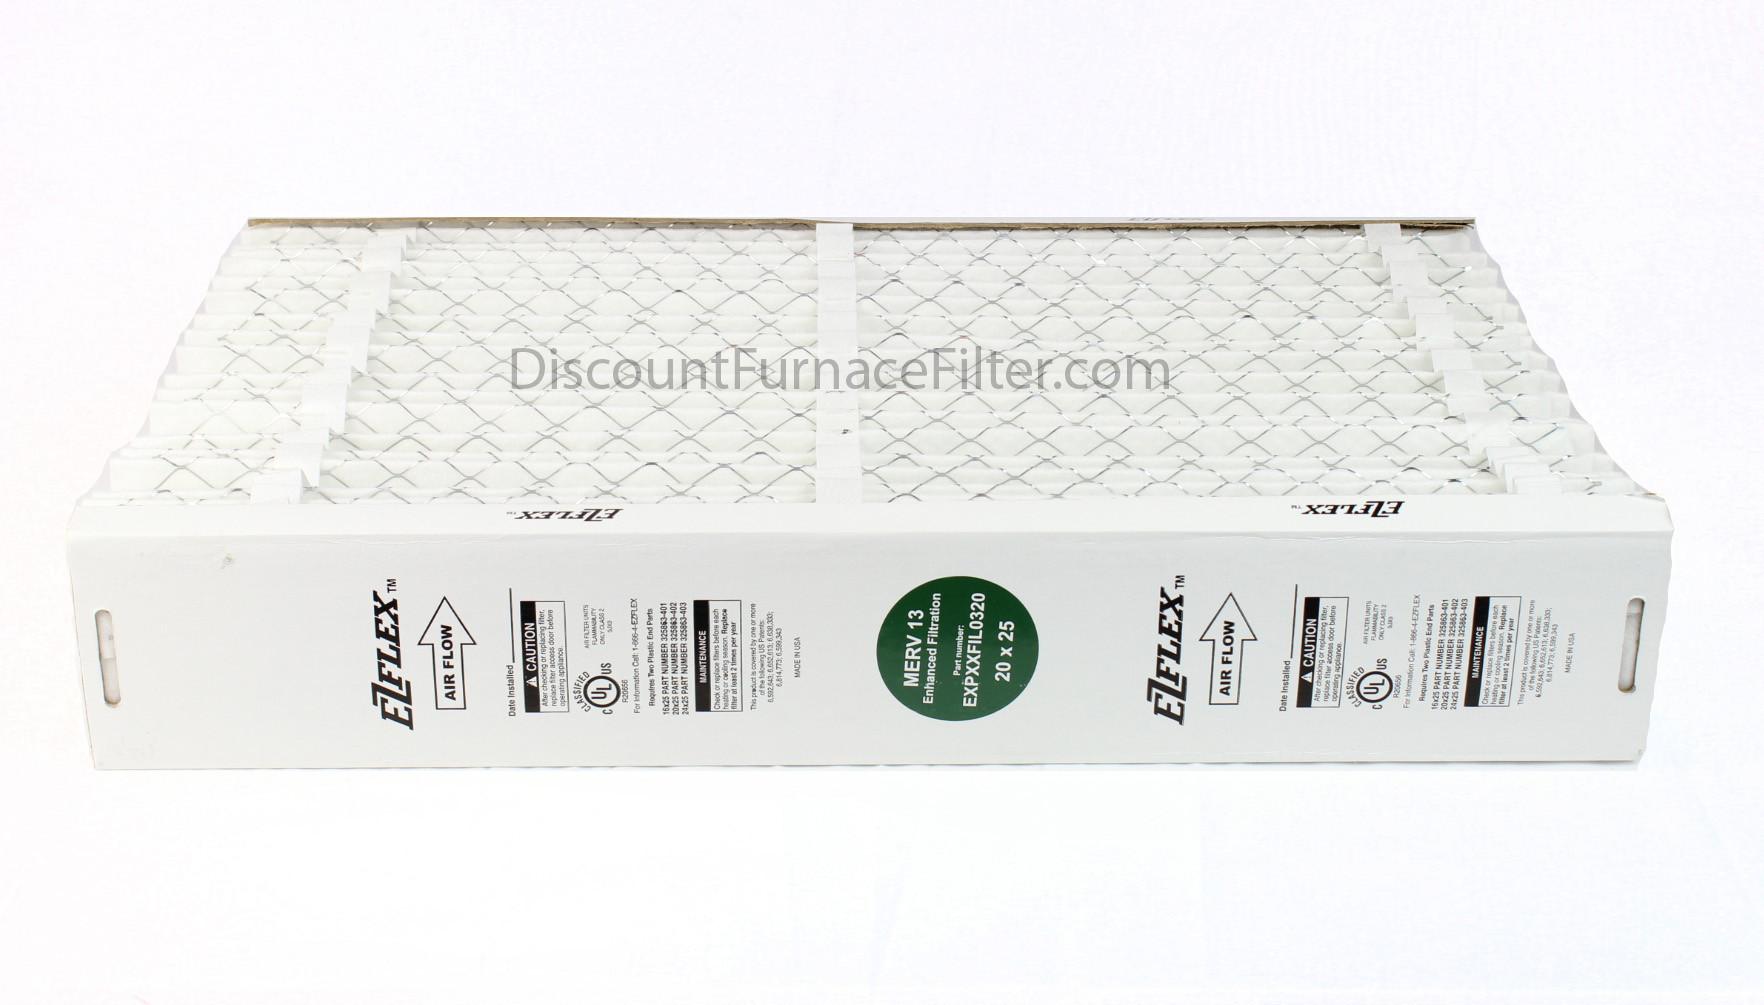 "Carrier EXPXXFIL0320 - EZ Flex 20"" Expandable Air Filter Merv 13, Filter Only"